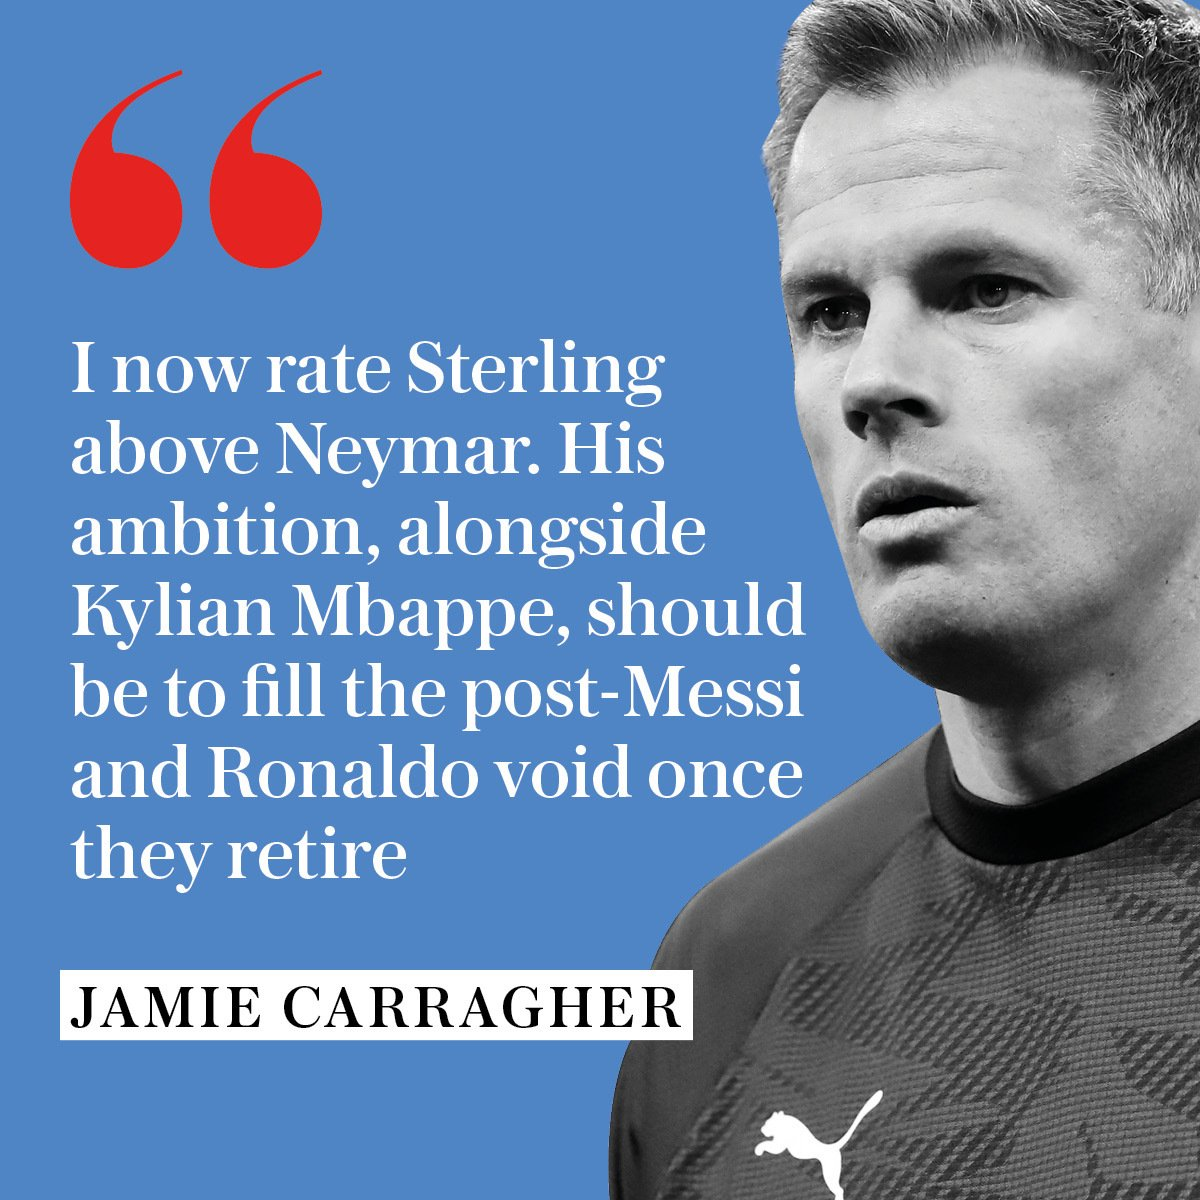 Exclusive @Carra23 column: Raheem Sterling's development reminds me of Cristiano Ronaldo - he can win the Ballon d'Or #MCFC  https://www.telegraph.co.uk/football/2019/09/13/raheem-sterlings-development-reminds-cristiano-ronaldo-can/…